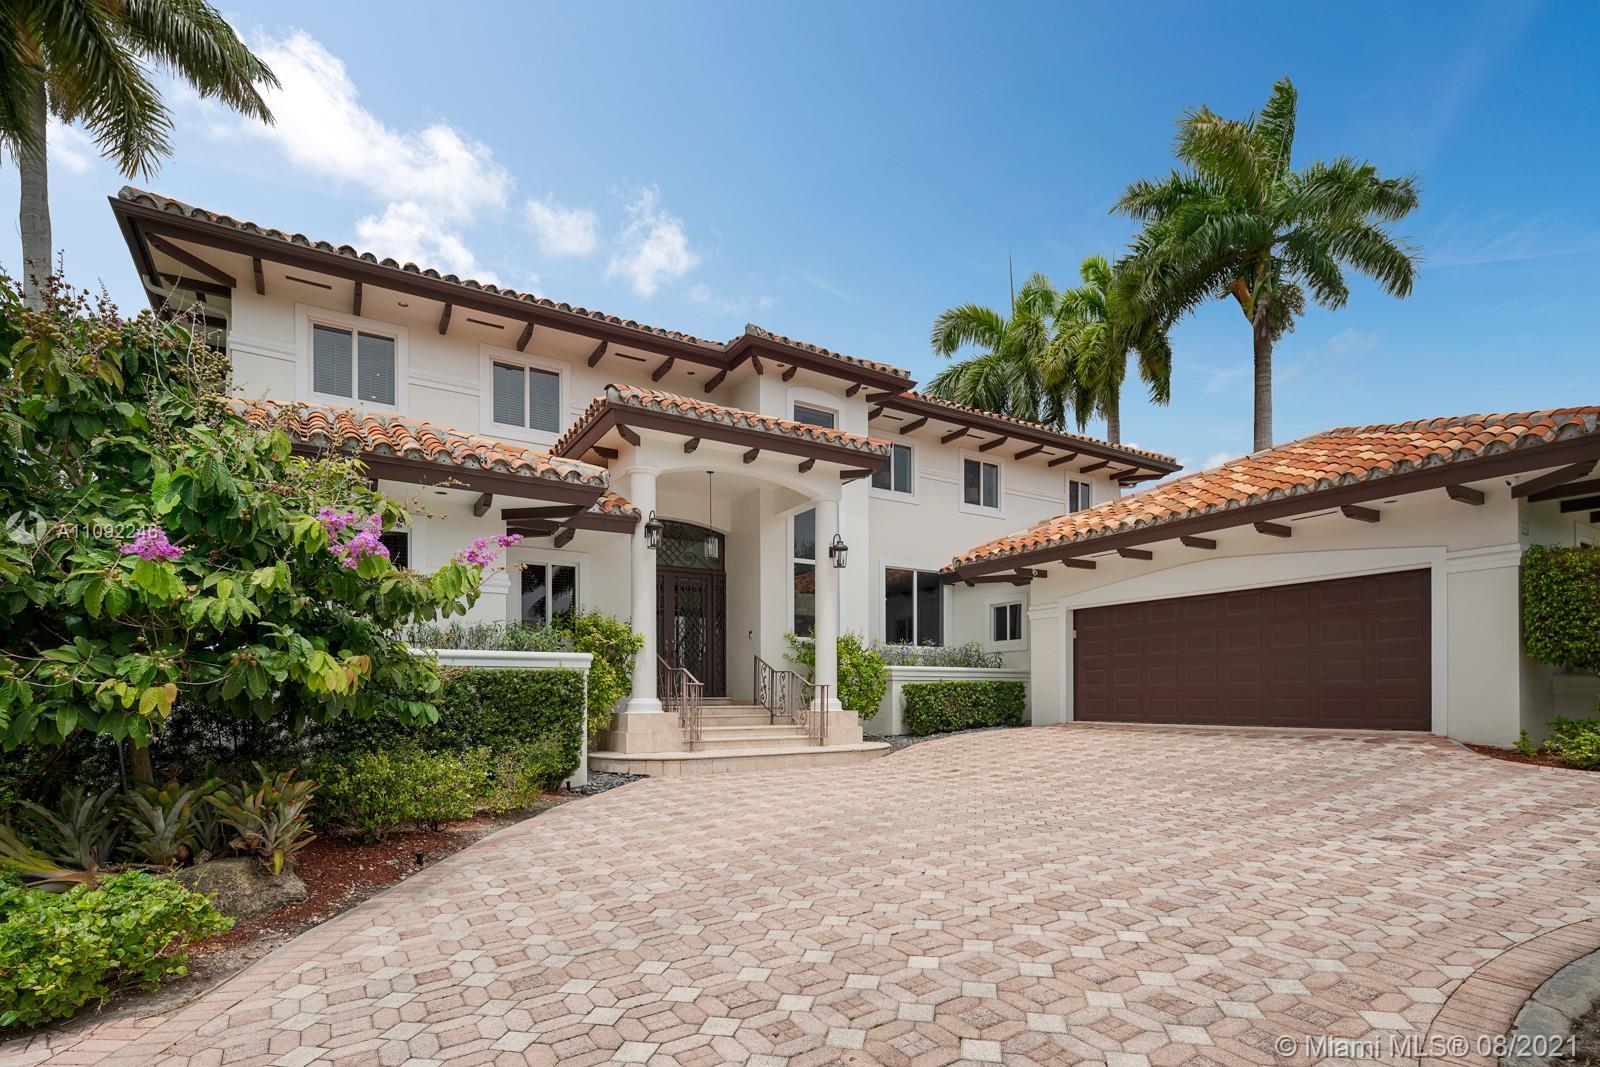 143 Rosales Ct, Coral Gables, Florida 33143